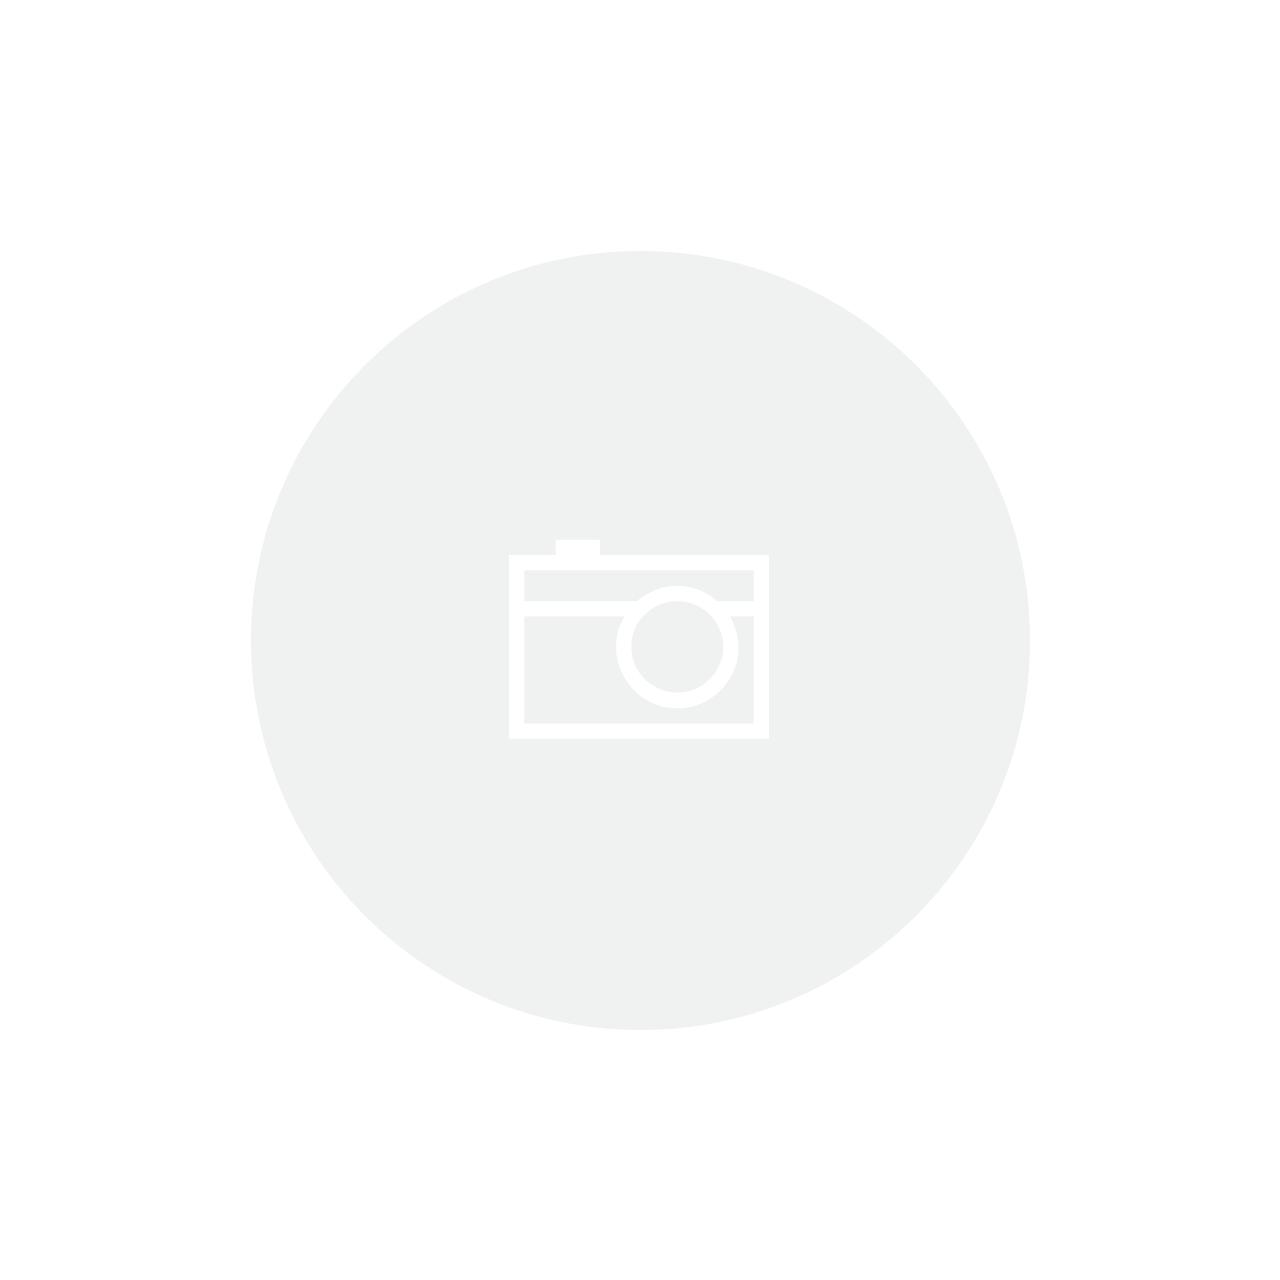 Placa Horizontal 4x2 - 1 módulo